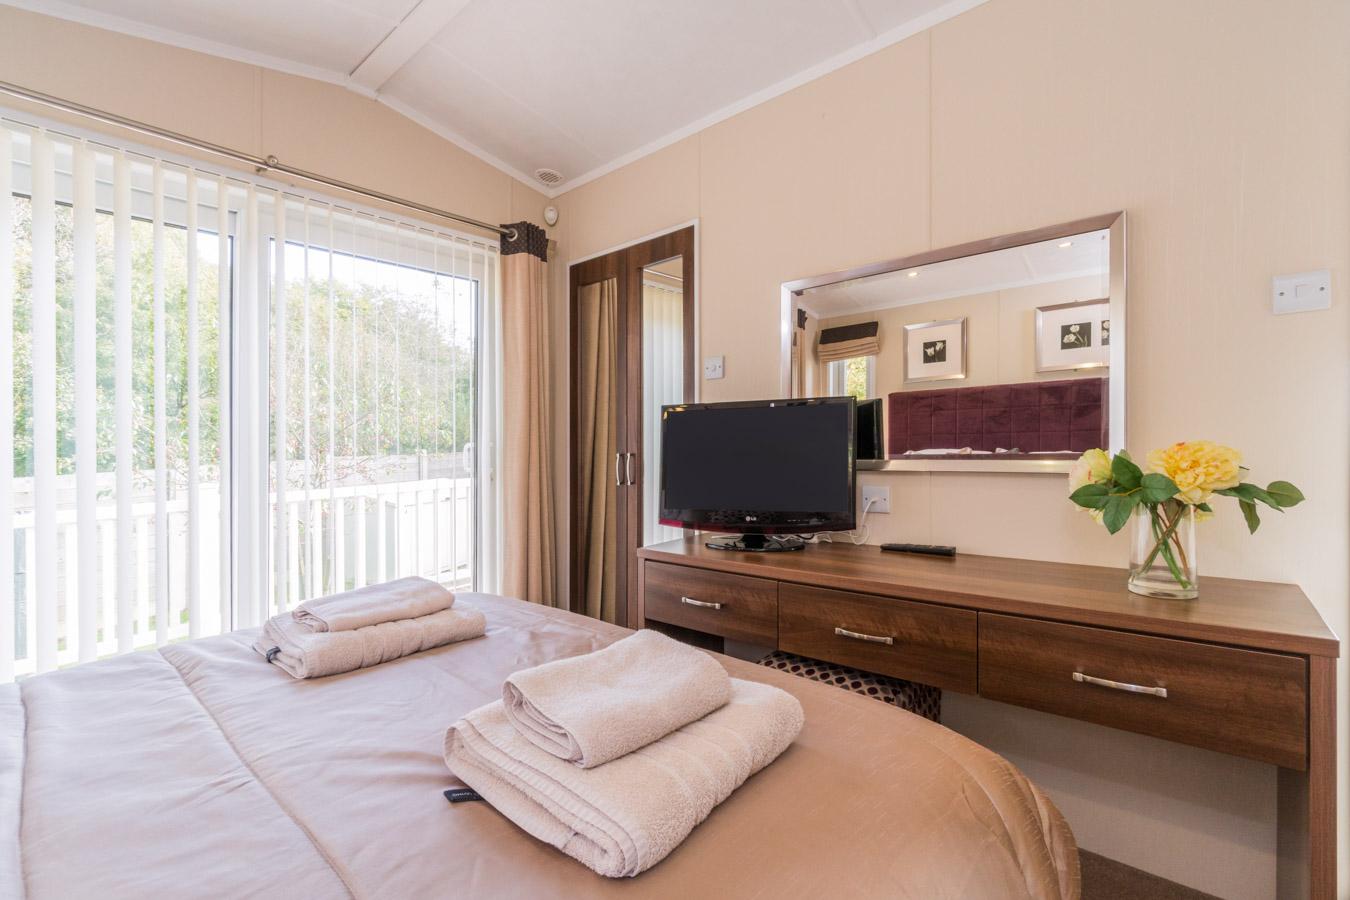 Neil-Bigwood-Monkton-Wyld-Holiday-Homes-59